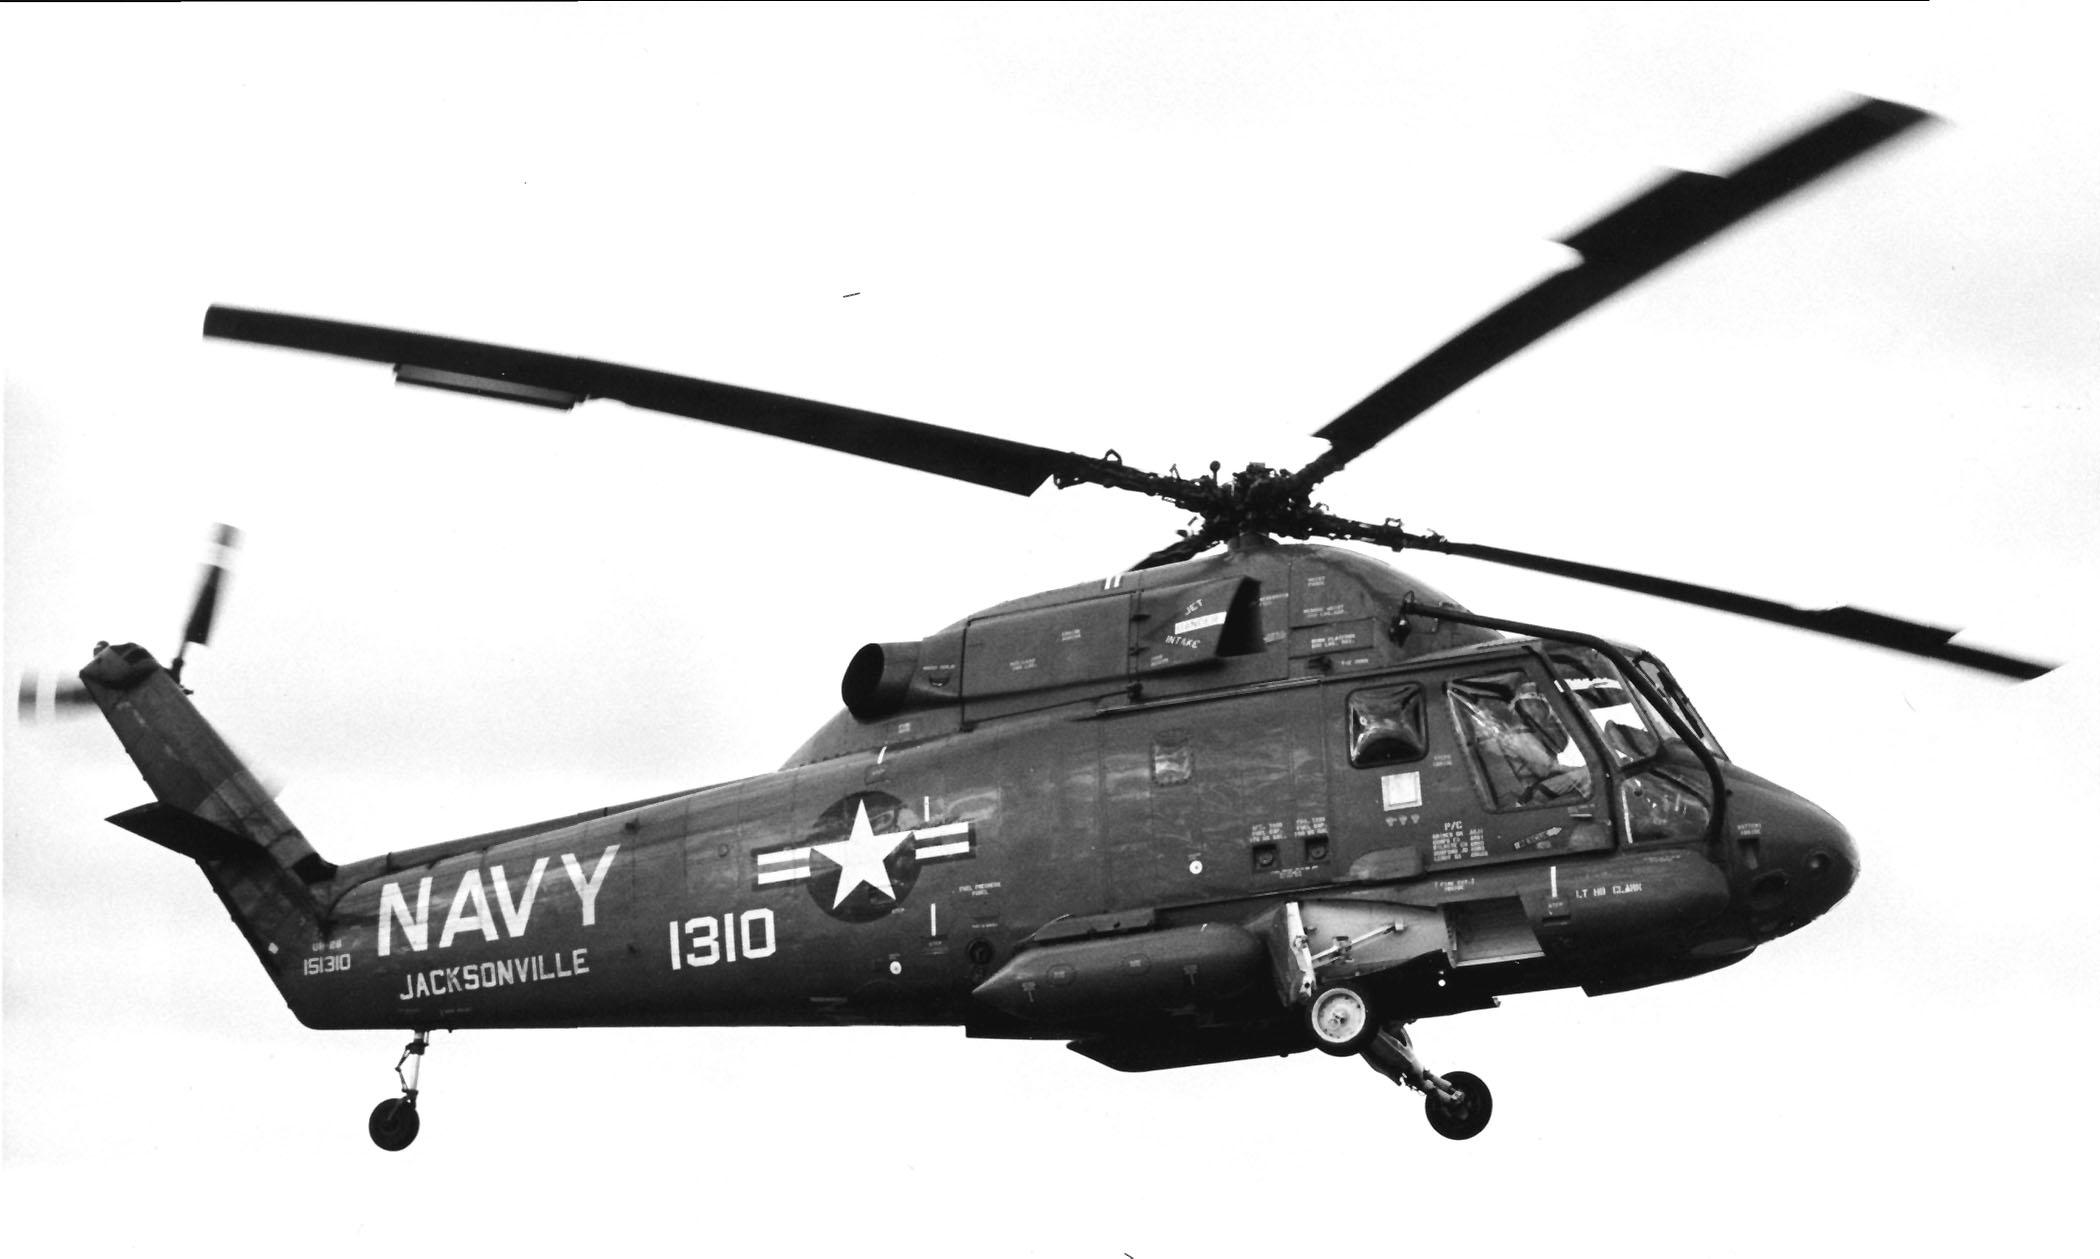 https://upload.wikimedia.org/wikipedia/commons/e/e1/UH-2Bnas_jax_helo_1968.jpg